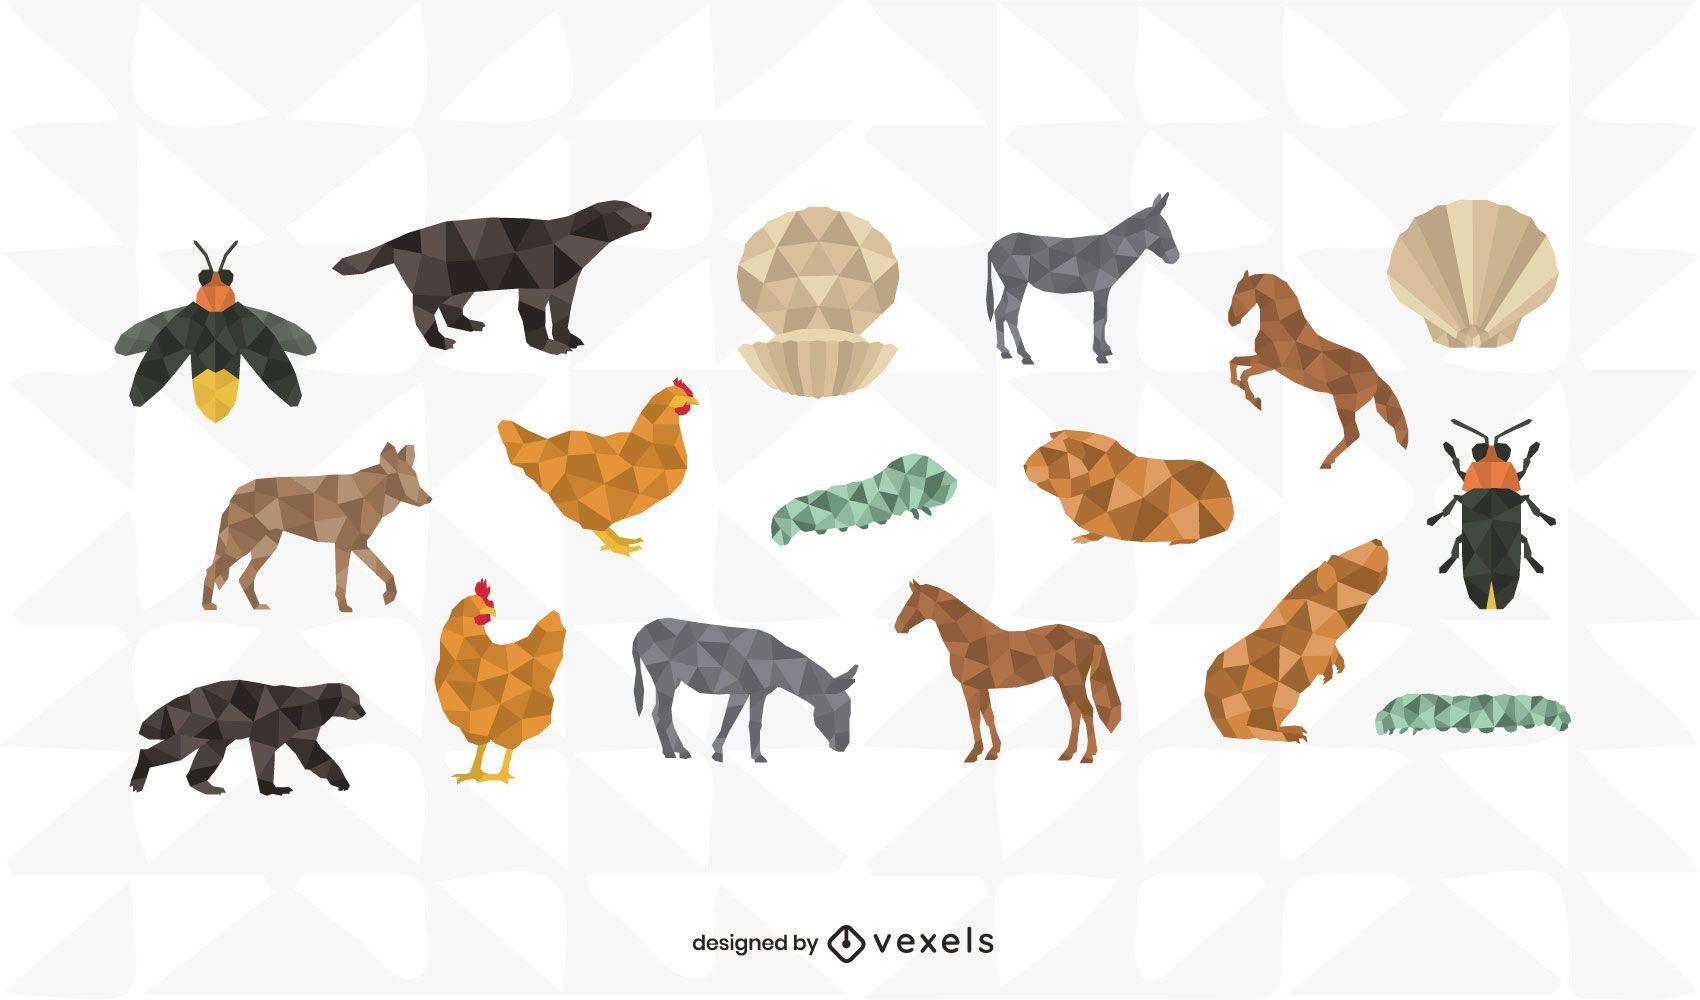 Polygonal animal design set